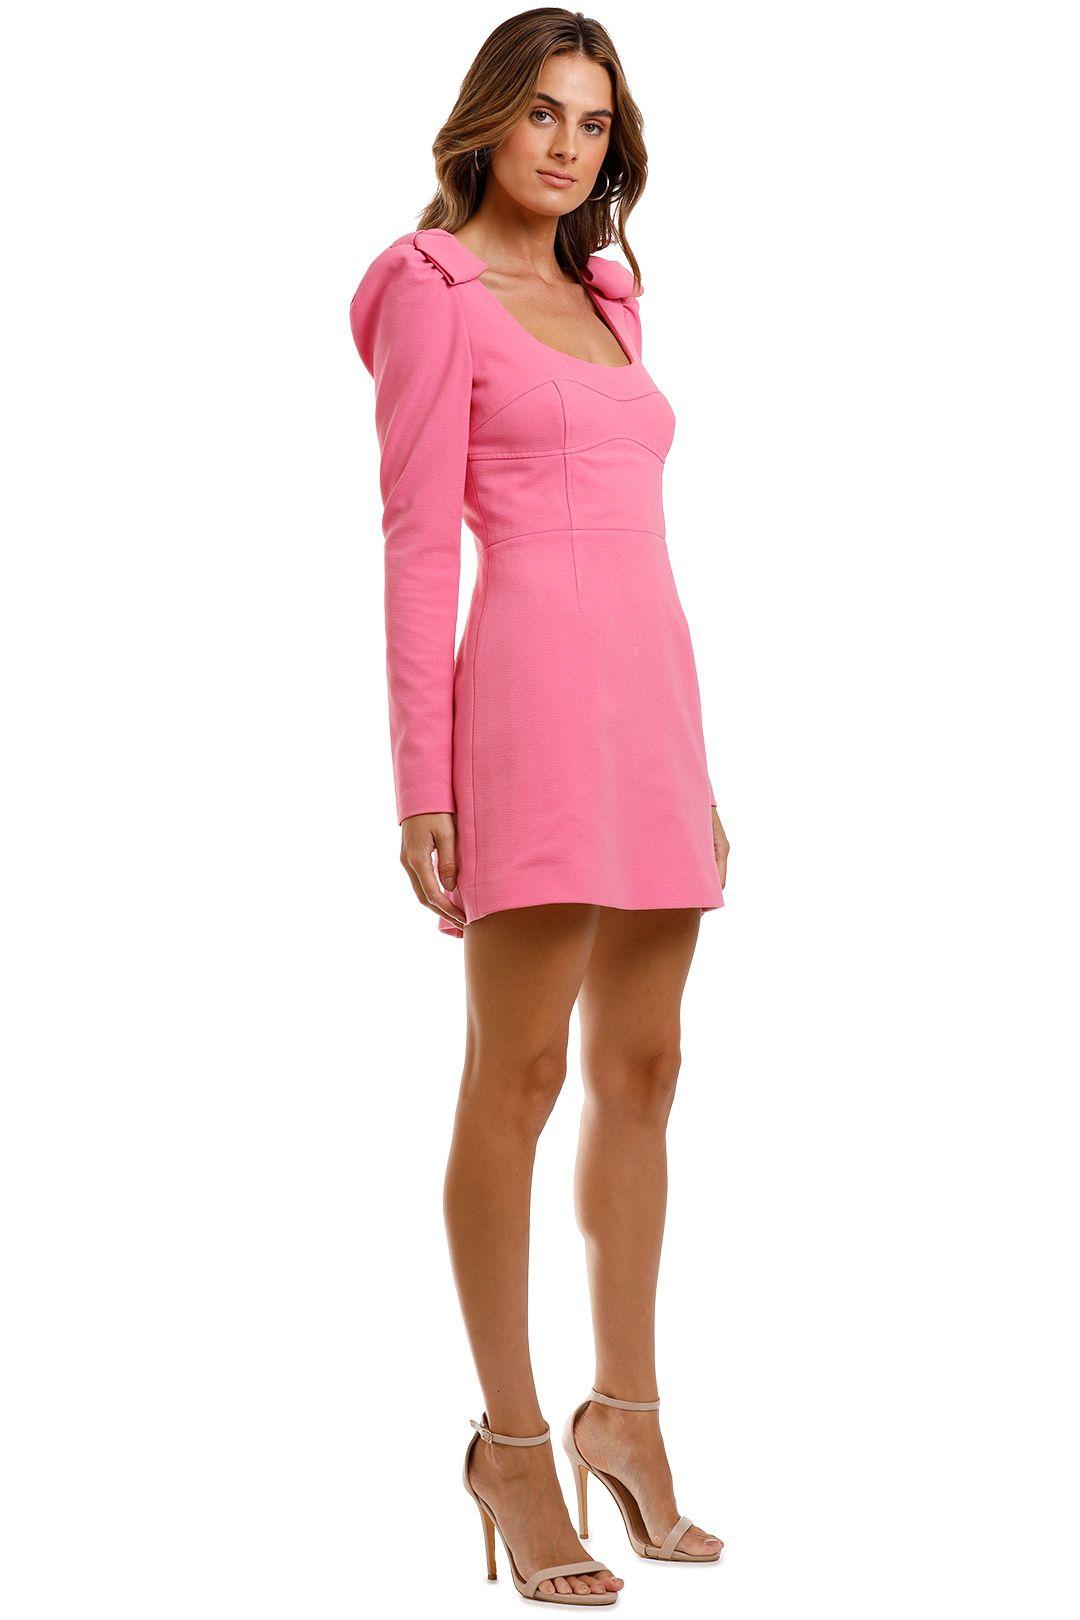 Rebecca Vallance Love Mini Dress Pink Long Sleeve